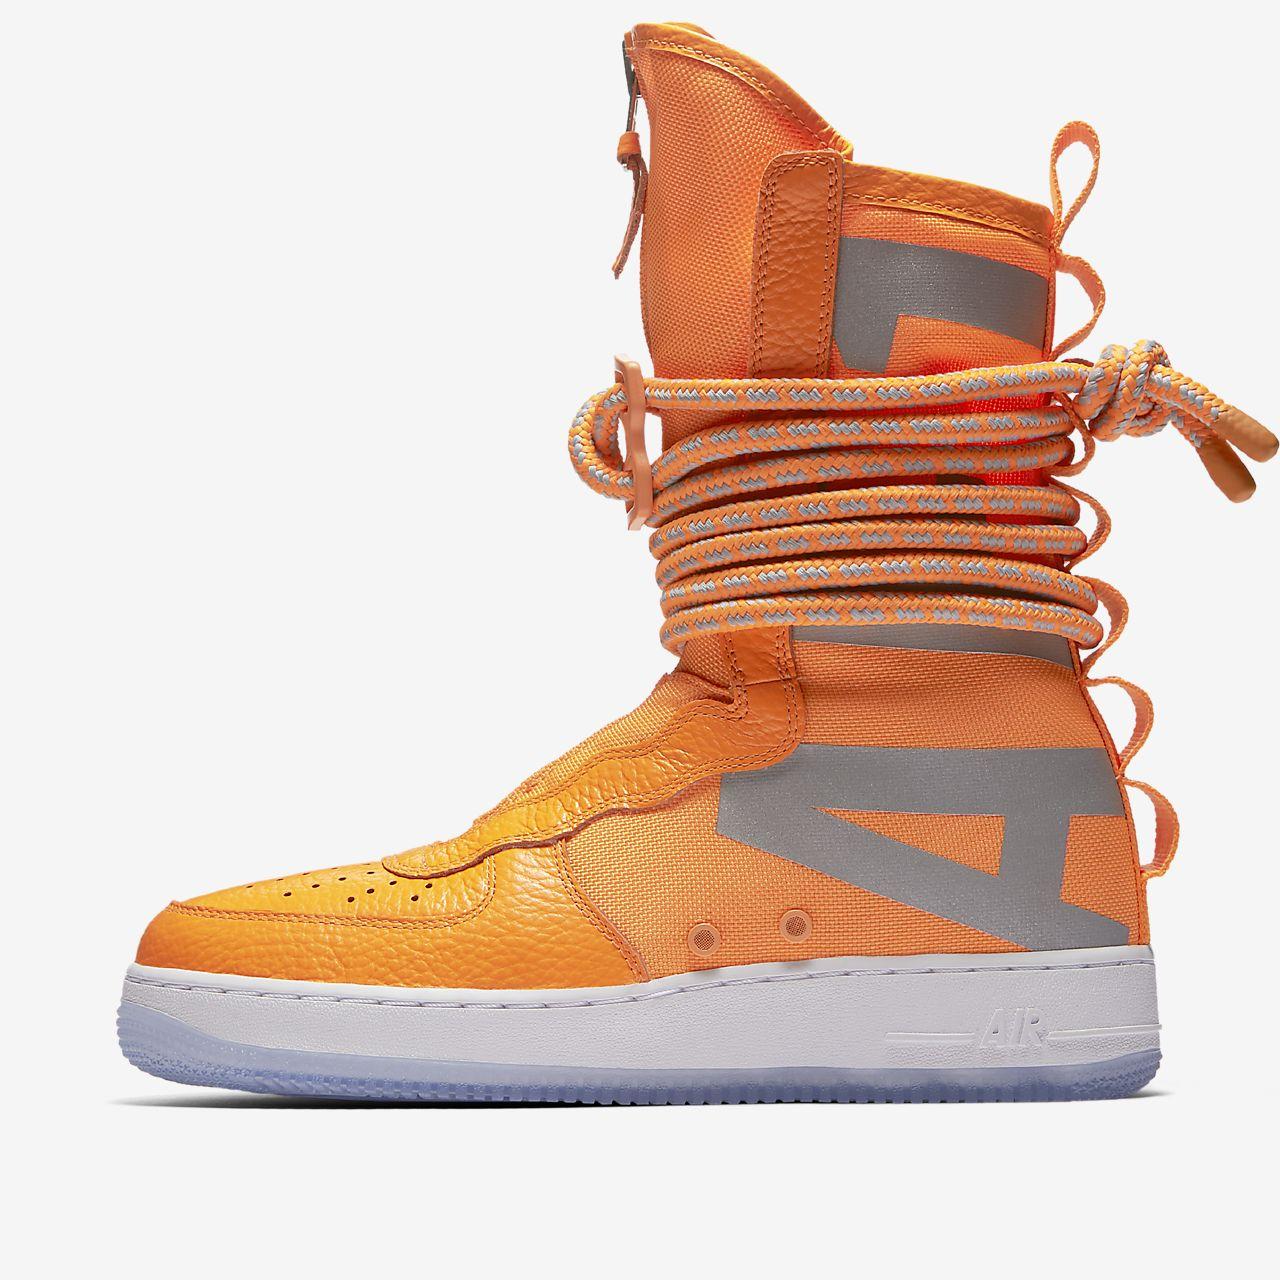 Nike Air Force 1 '07 Cnvs OlivaOliva Naranjas 579927 200